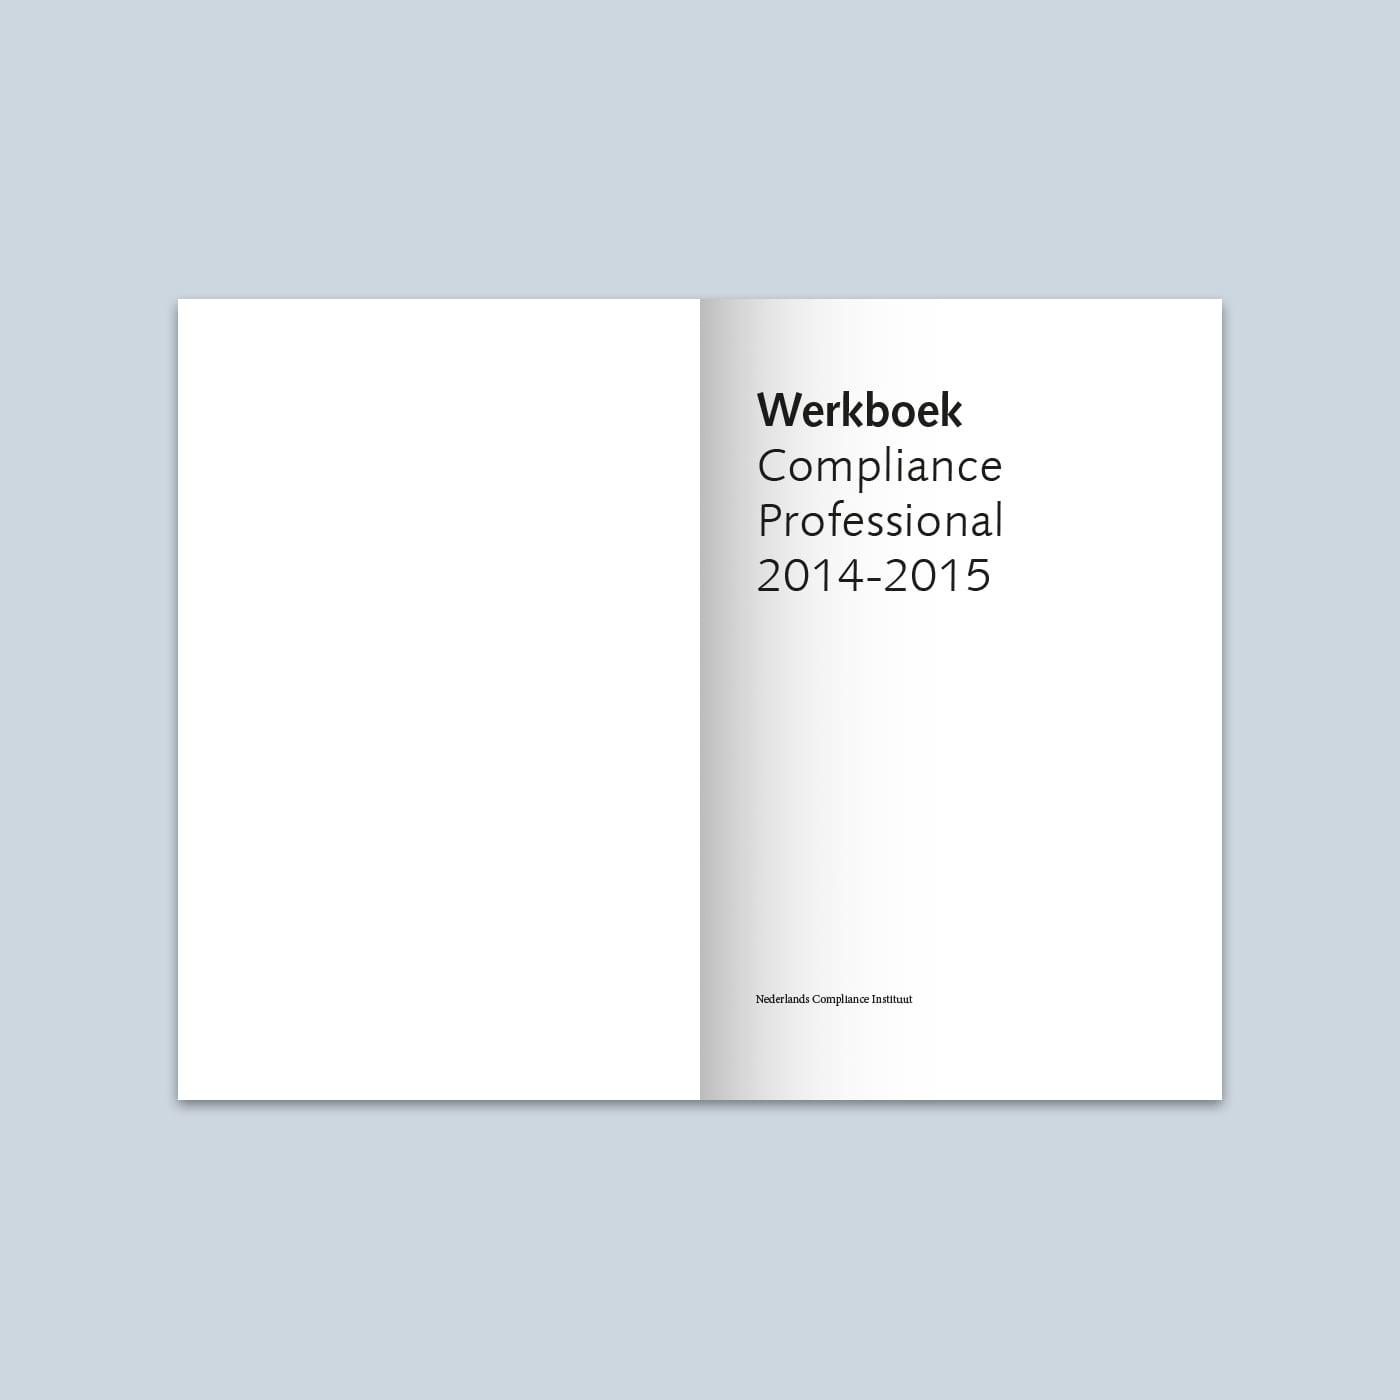 Werkboek Compliance Professional 2015 titelpagina